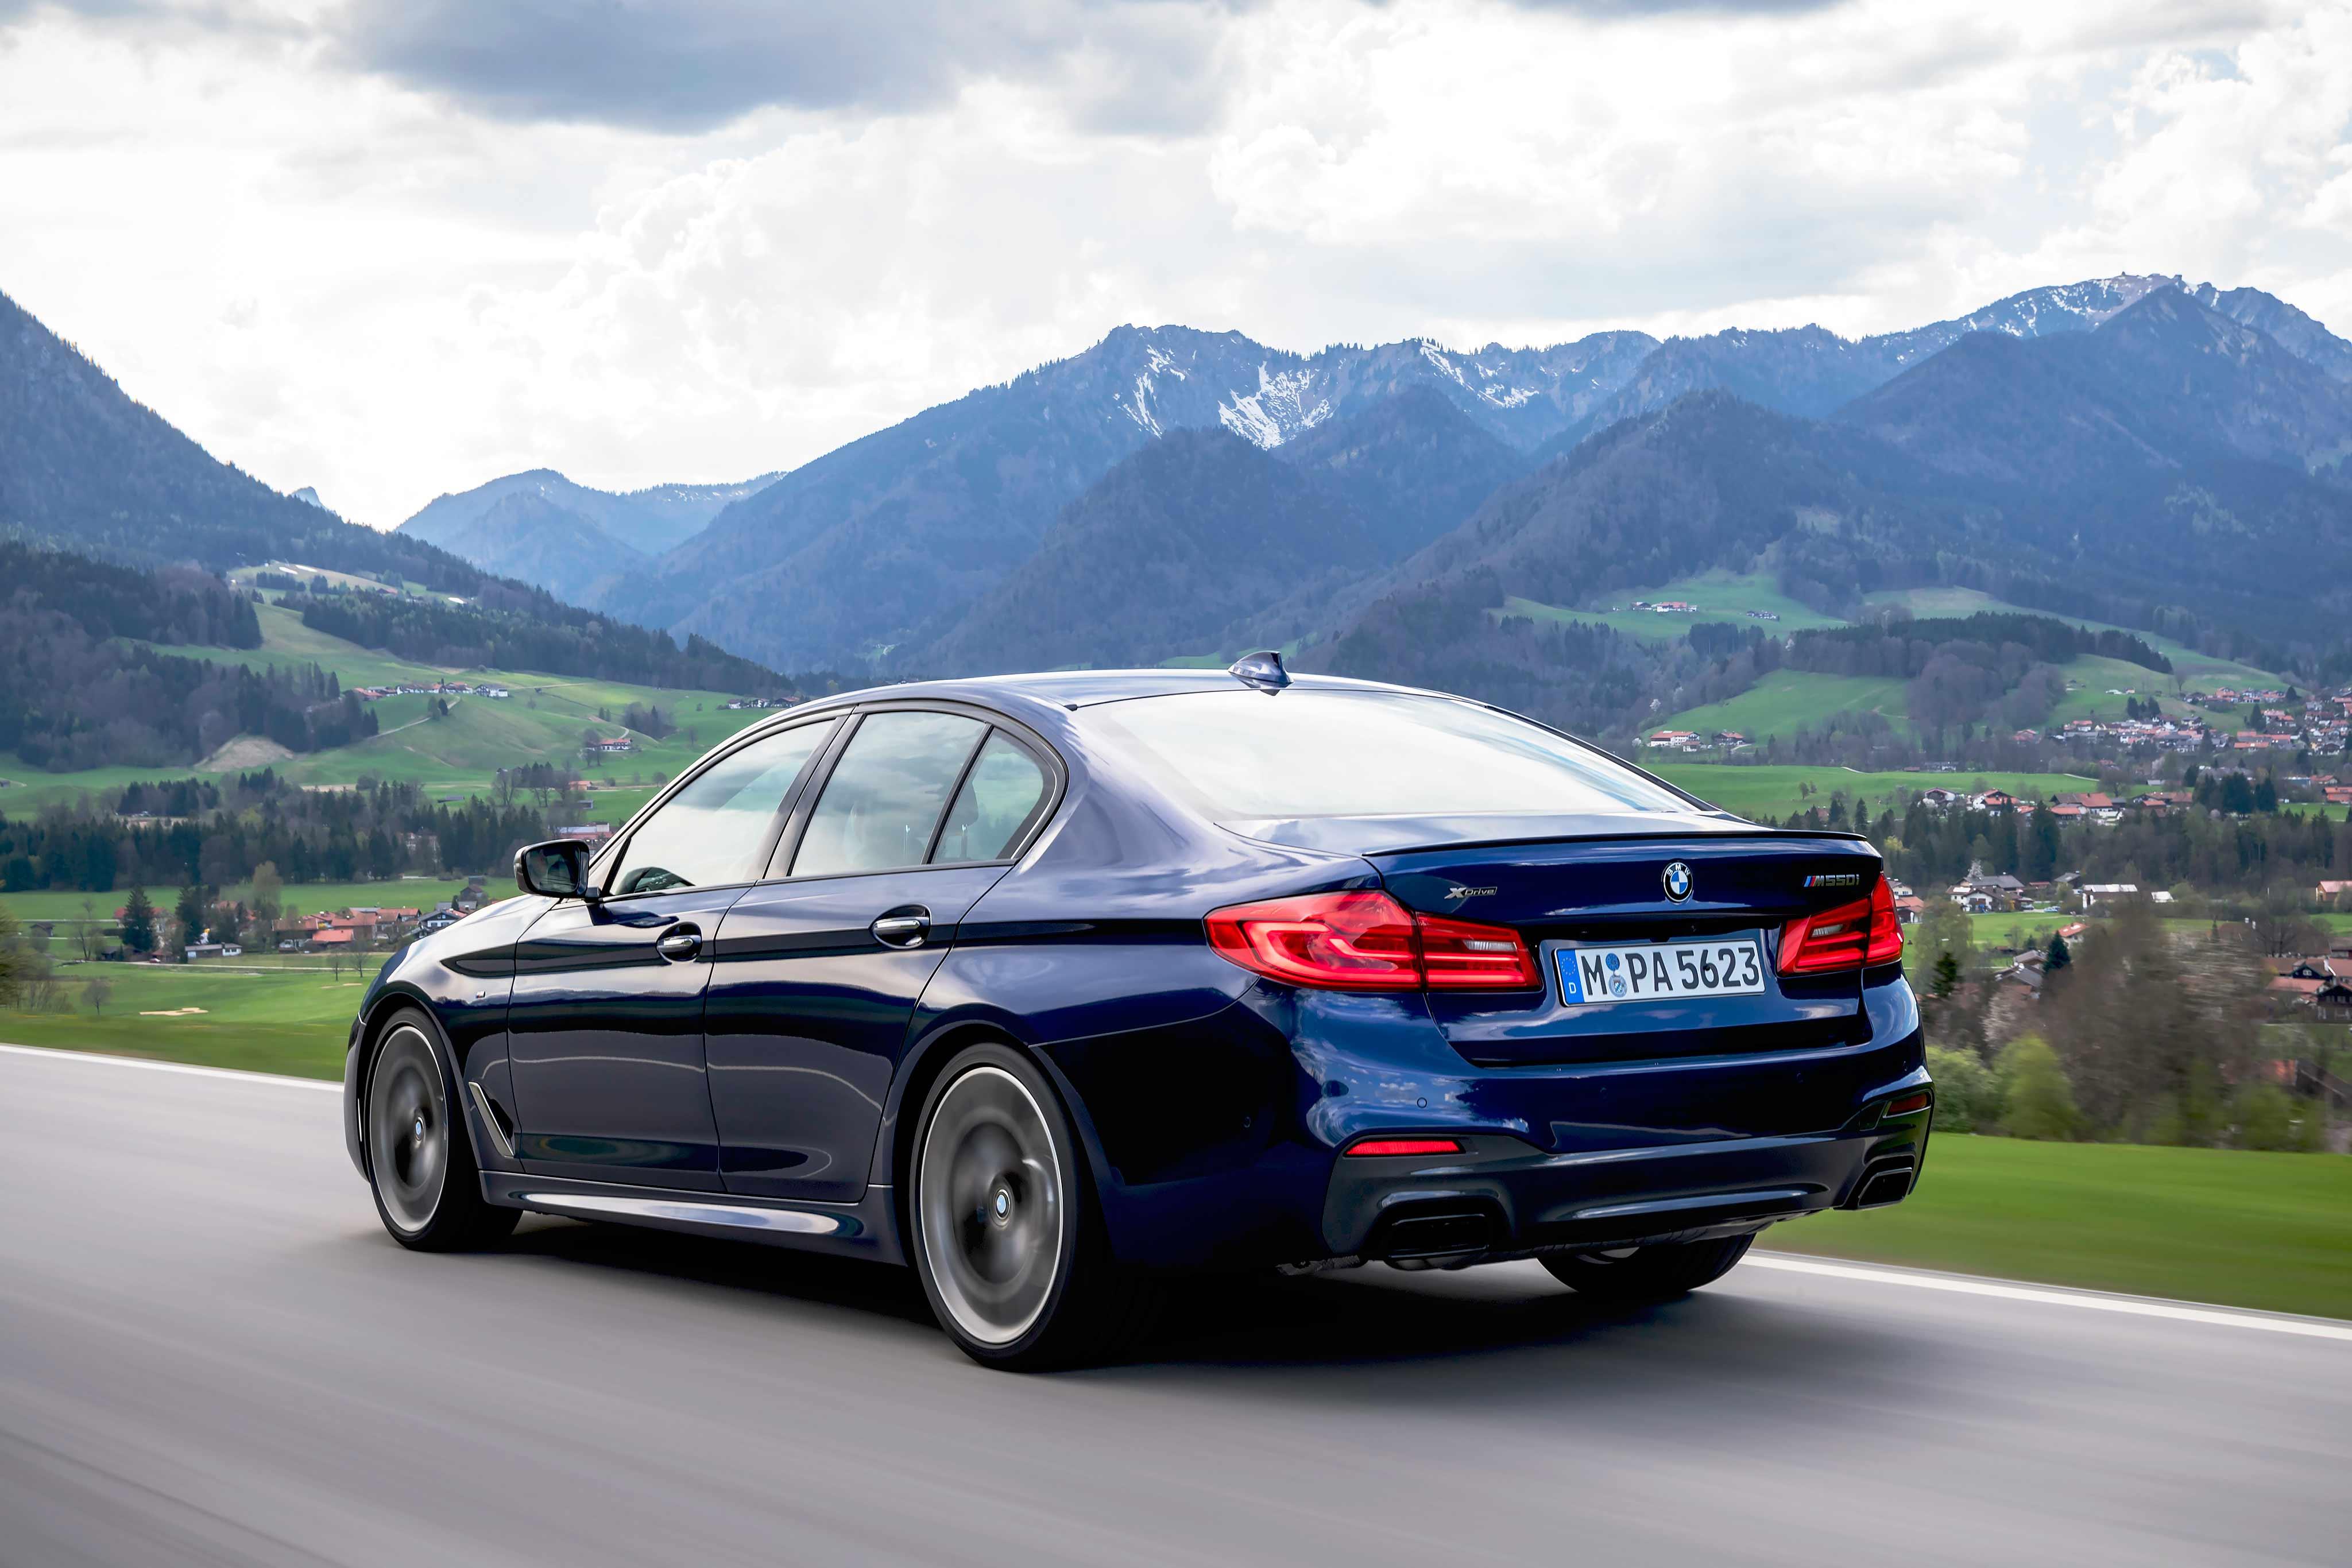 2017 BMW M550i xDrive G30 test drive - Drive-My Blogs - Drive